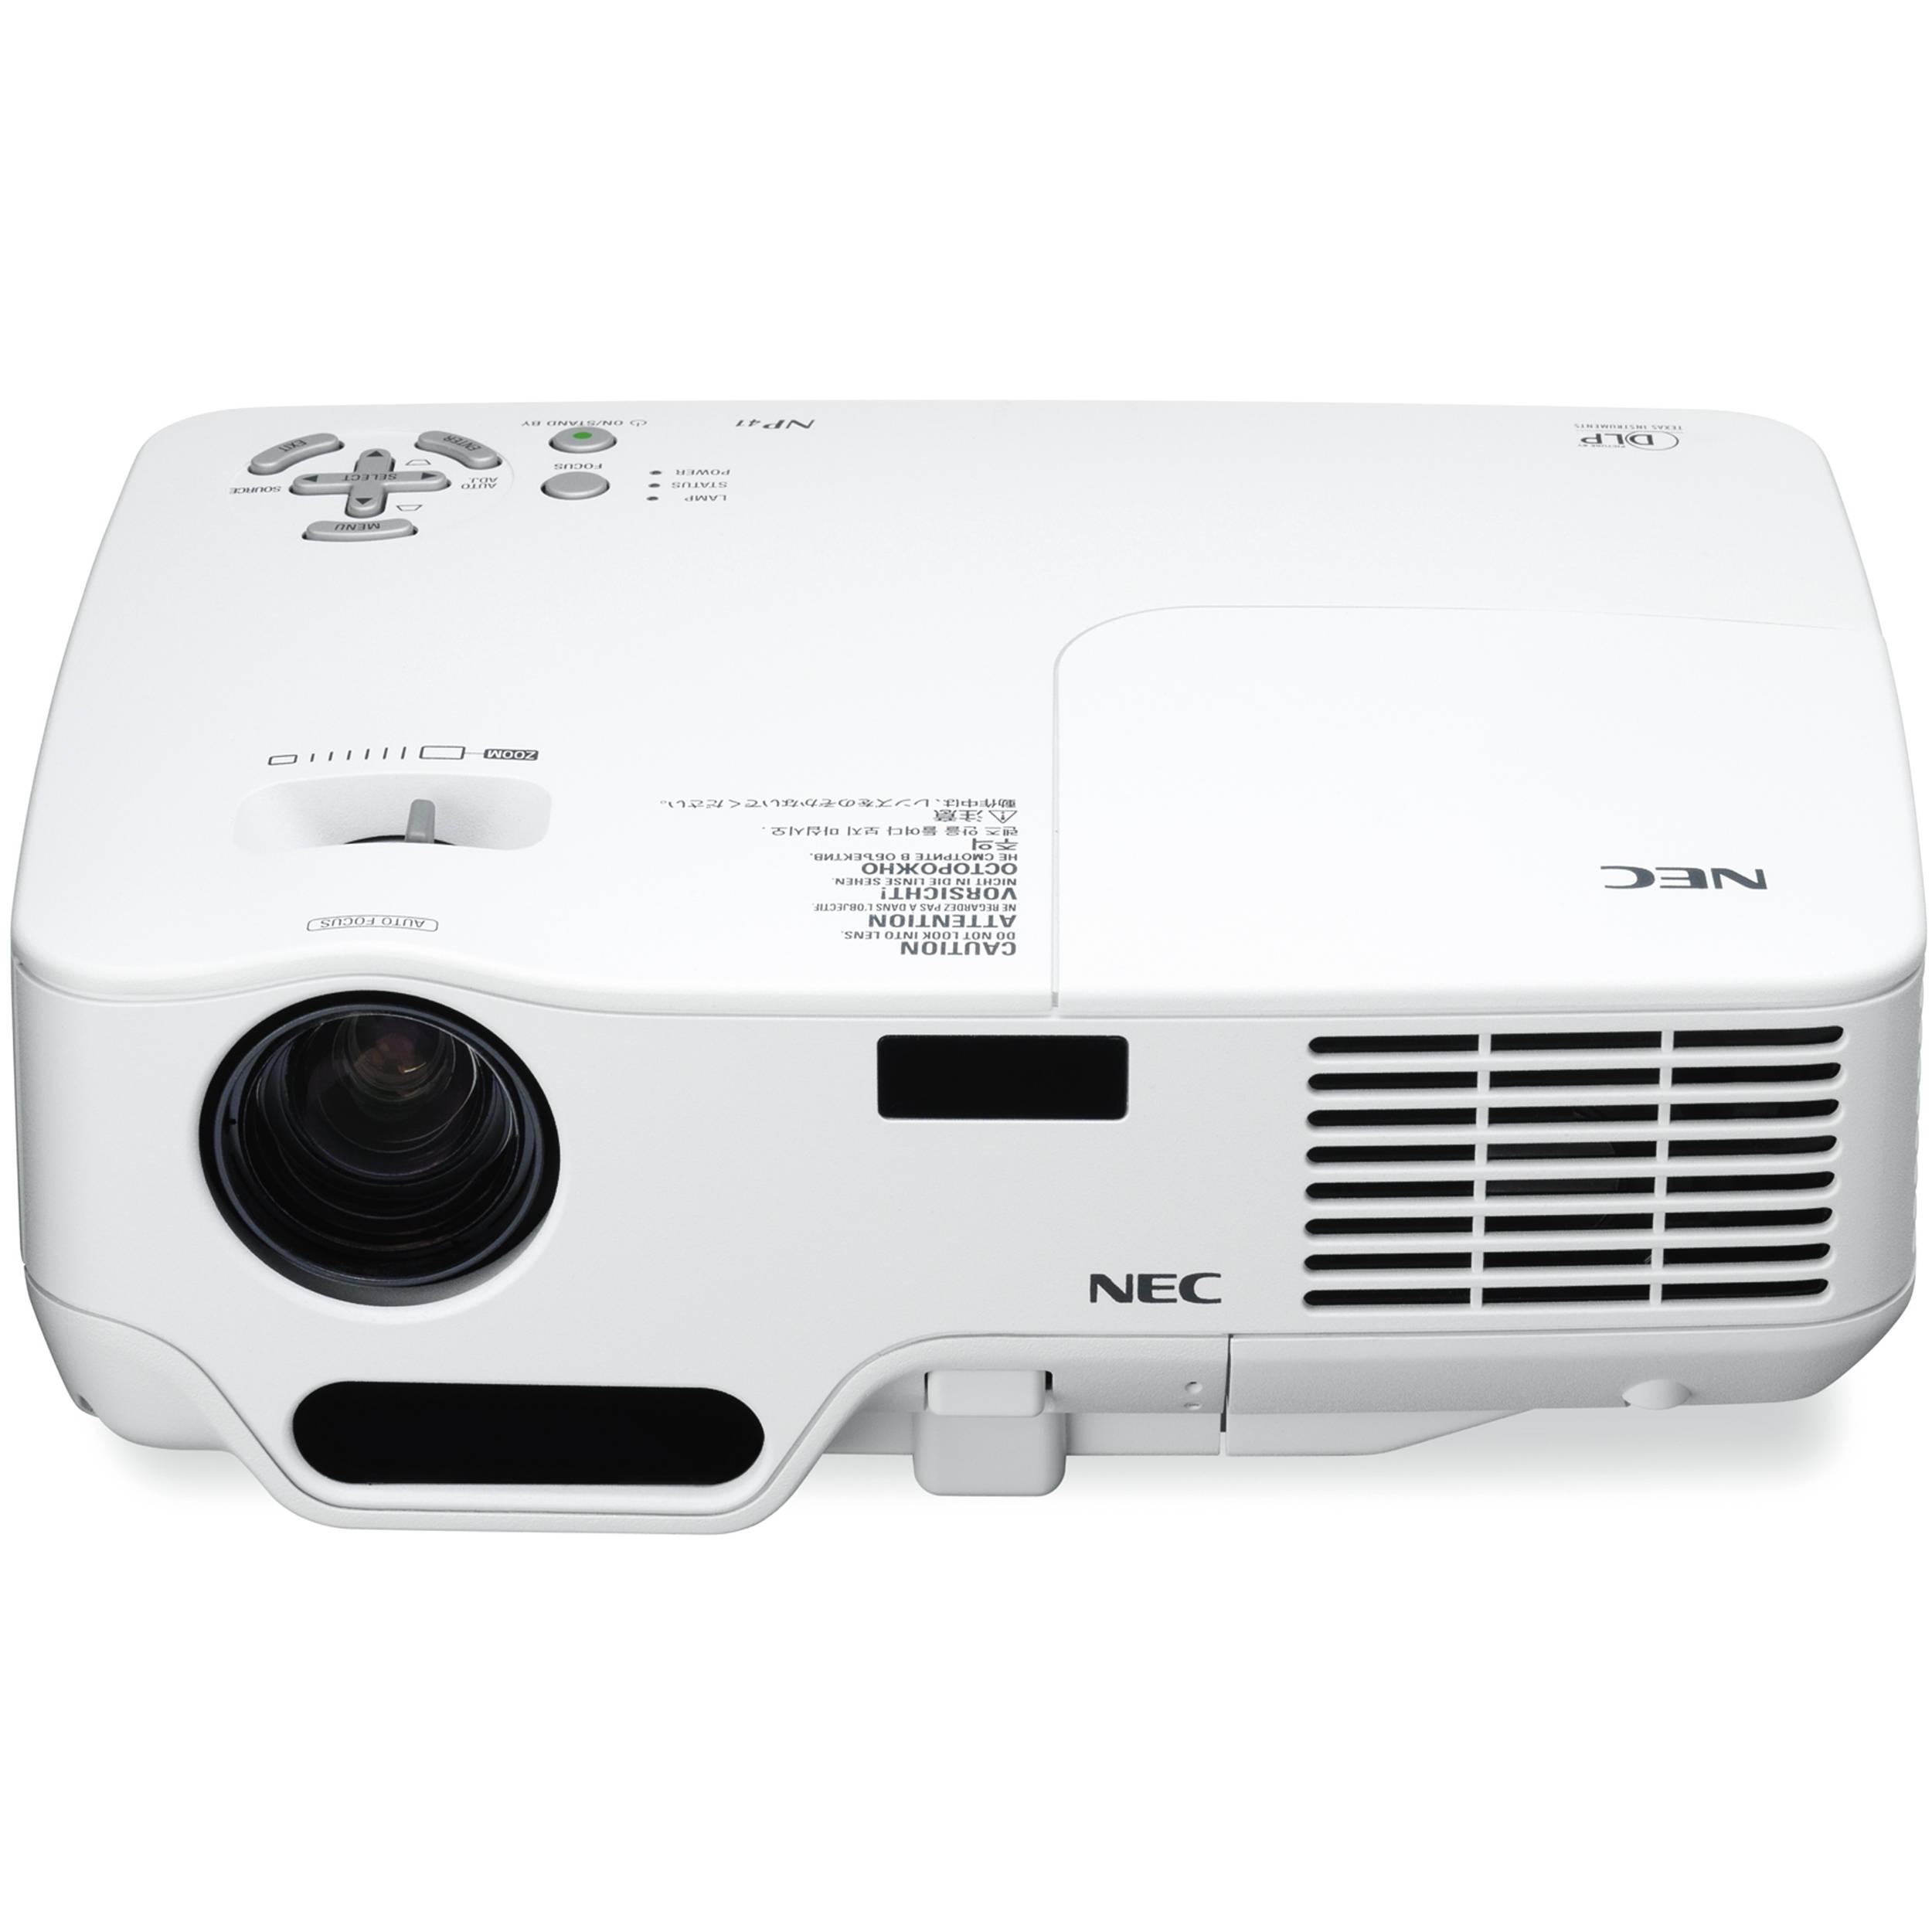 nec np41 dlp xga 2300 lumens projector np41 b h photo video rh bhphotovideo com nec projector np115 user manual nec np1000 projector user manual